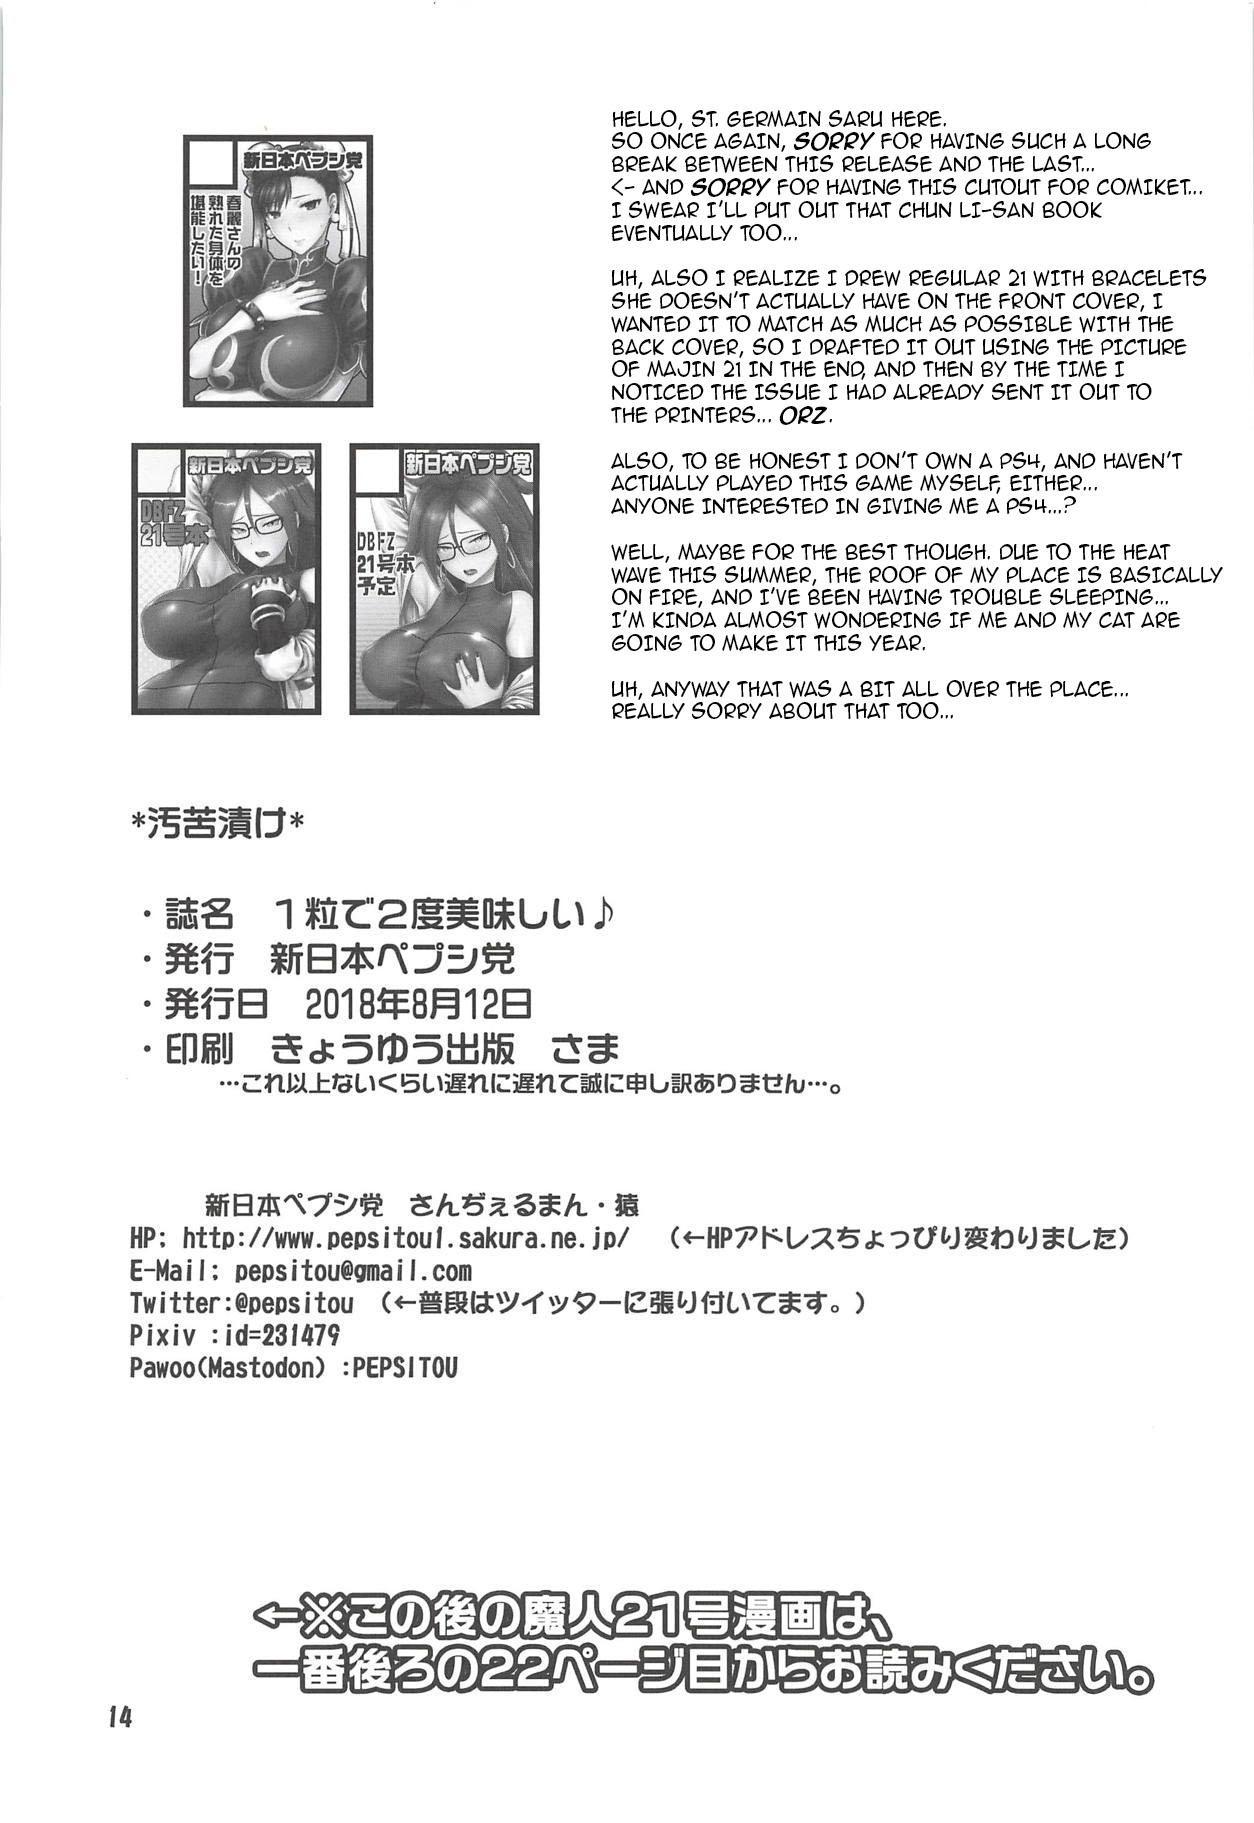 (C94) [Shinnihon Pepsitou (St.germain-sal)] 1-tsubu de 2-do Oishii | 2 for 1 Delicious Fun (Dragon Ball FighterZ) [English] {darknight} 21